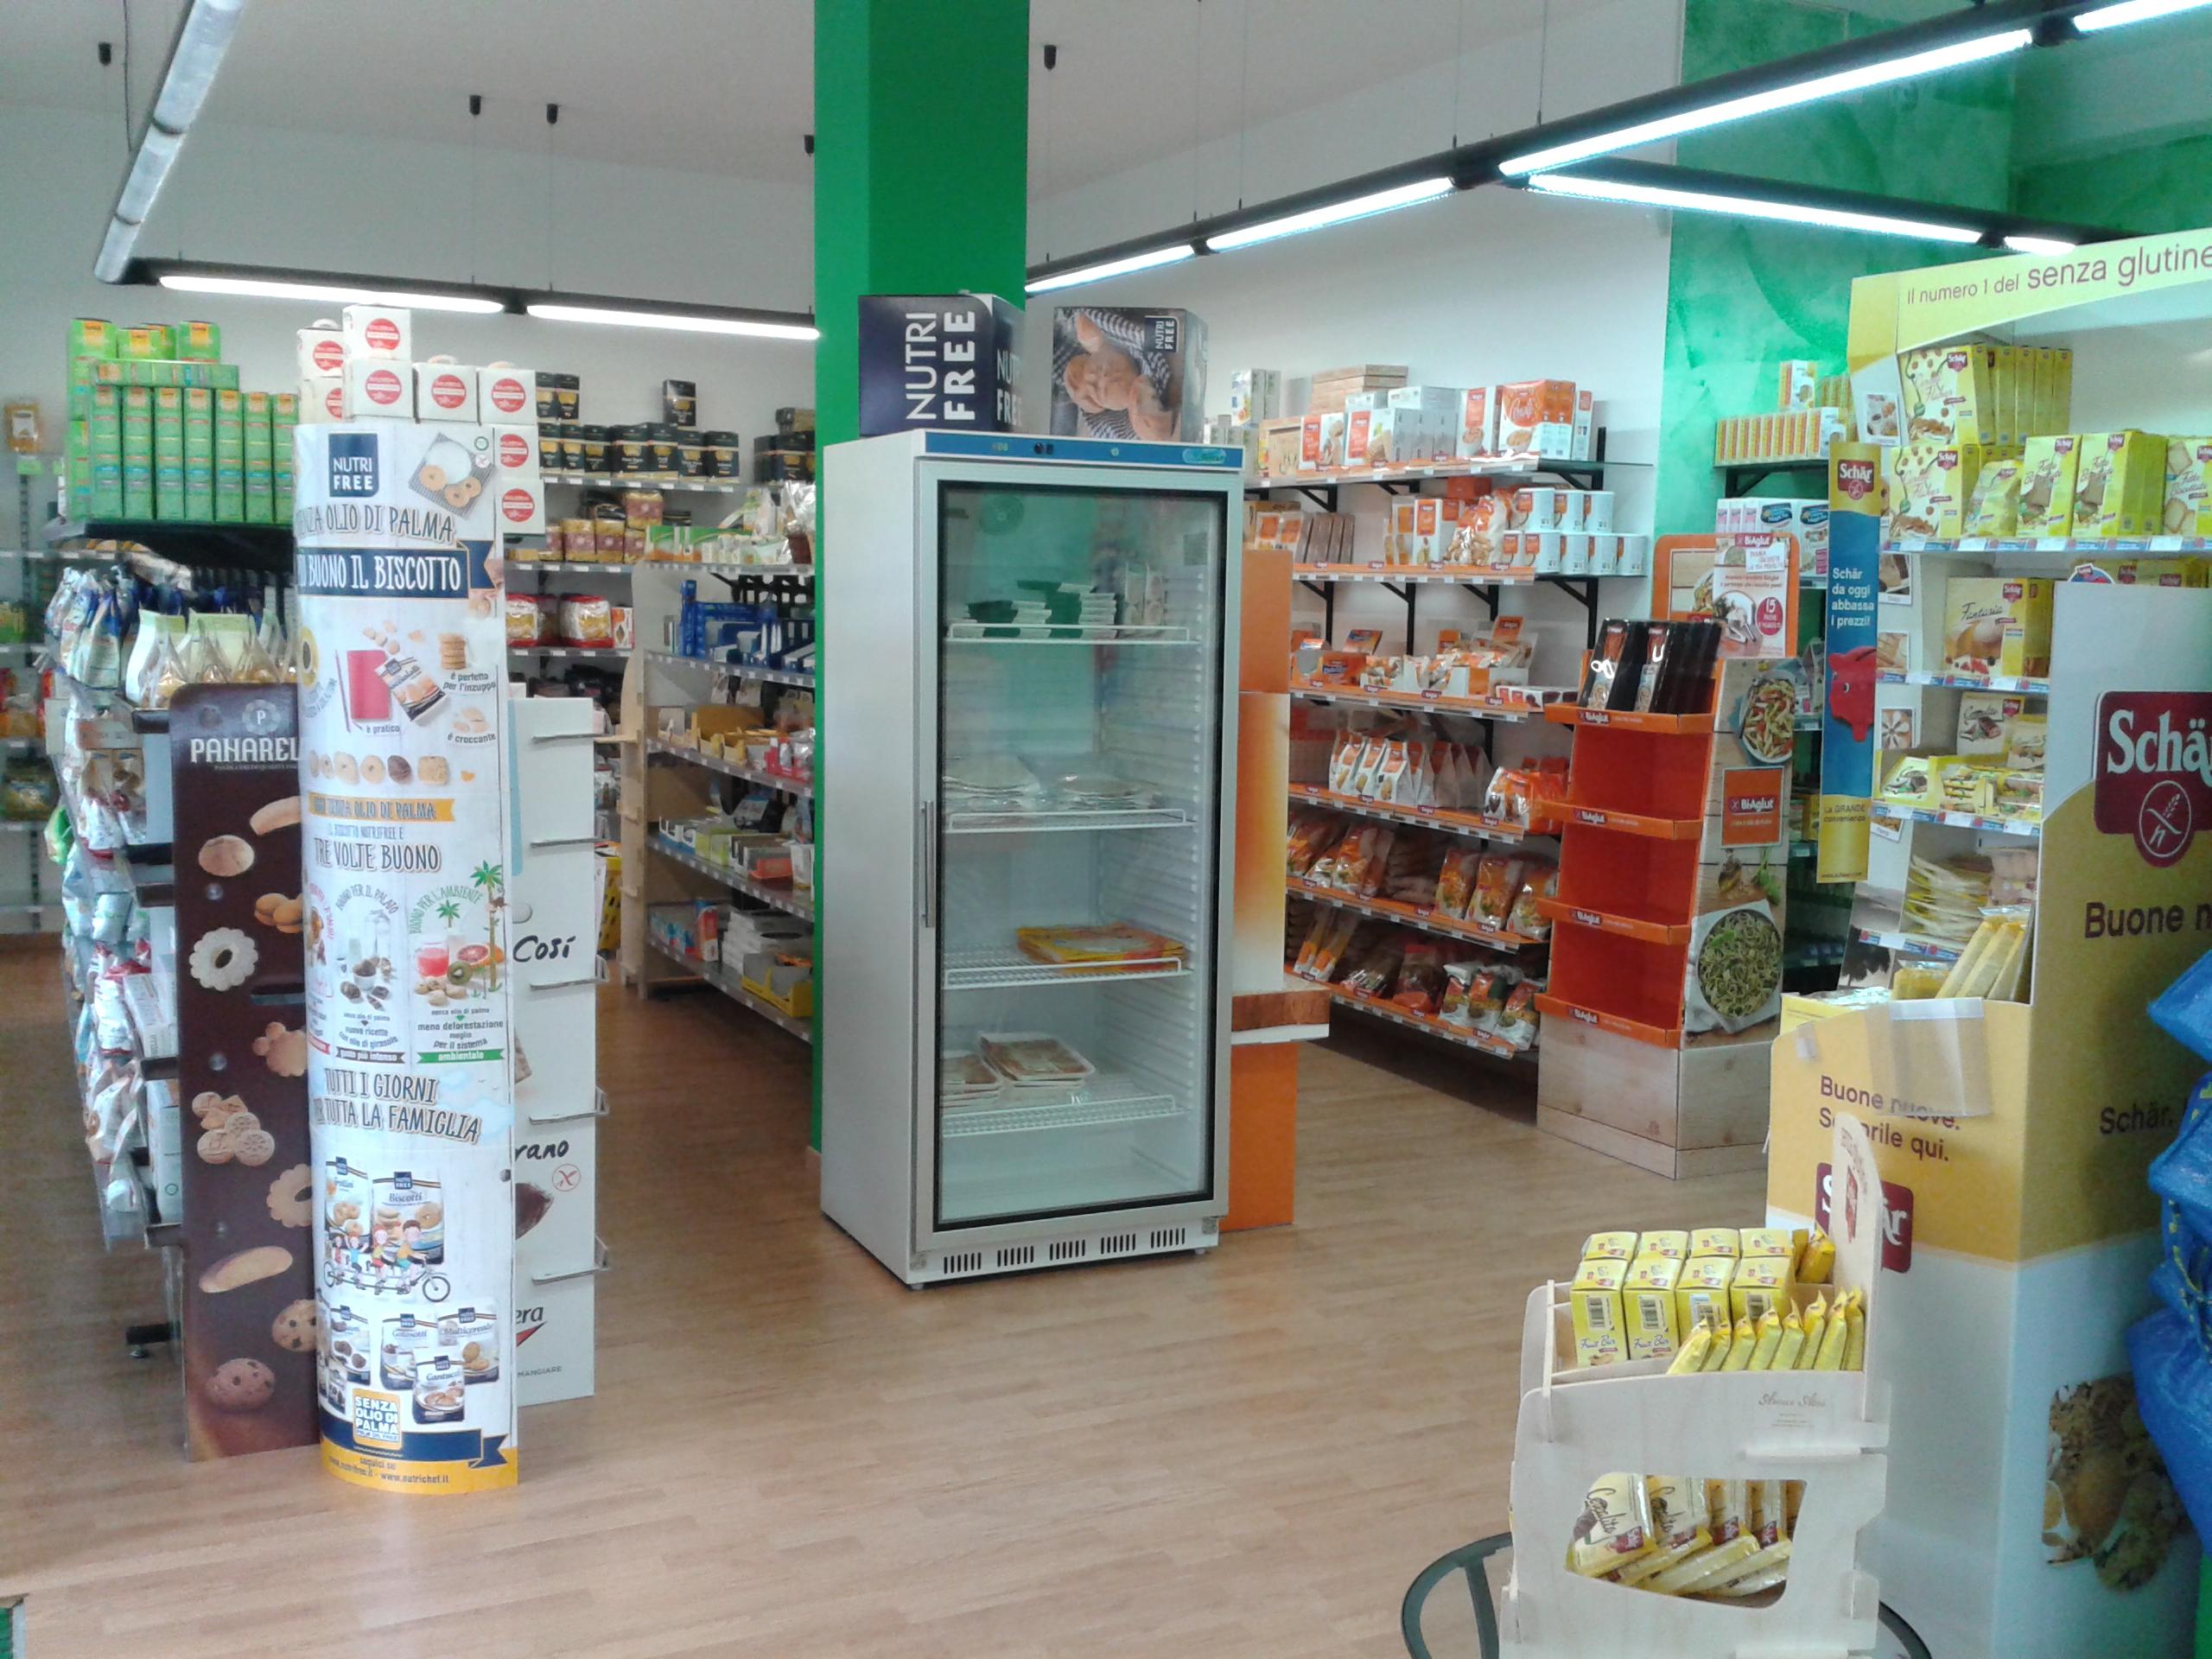 Celiachia Food Prodotti Senza Glutine 02